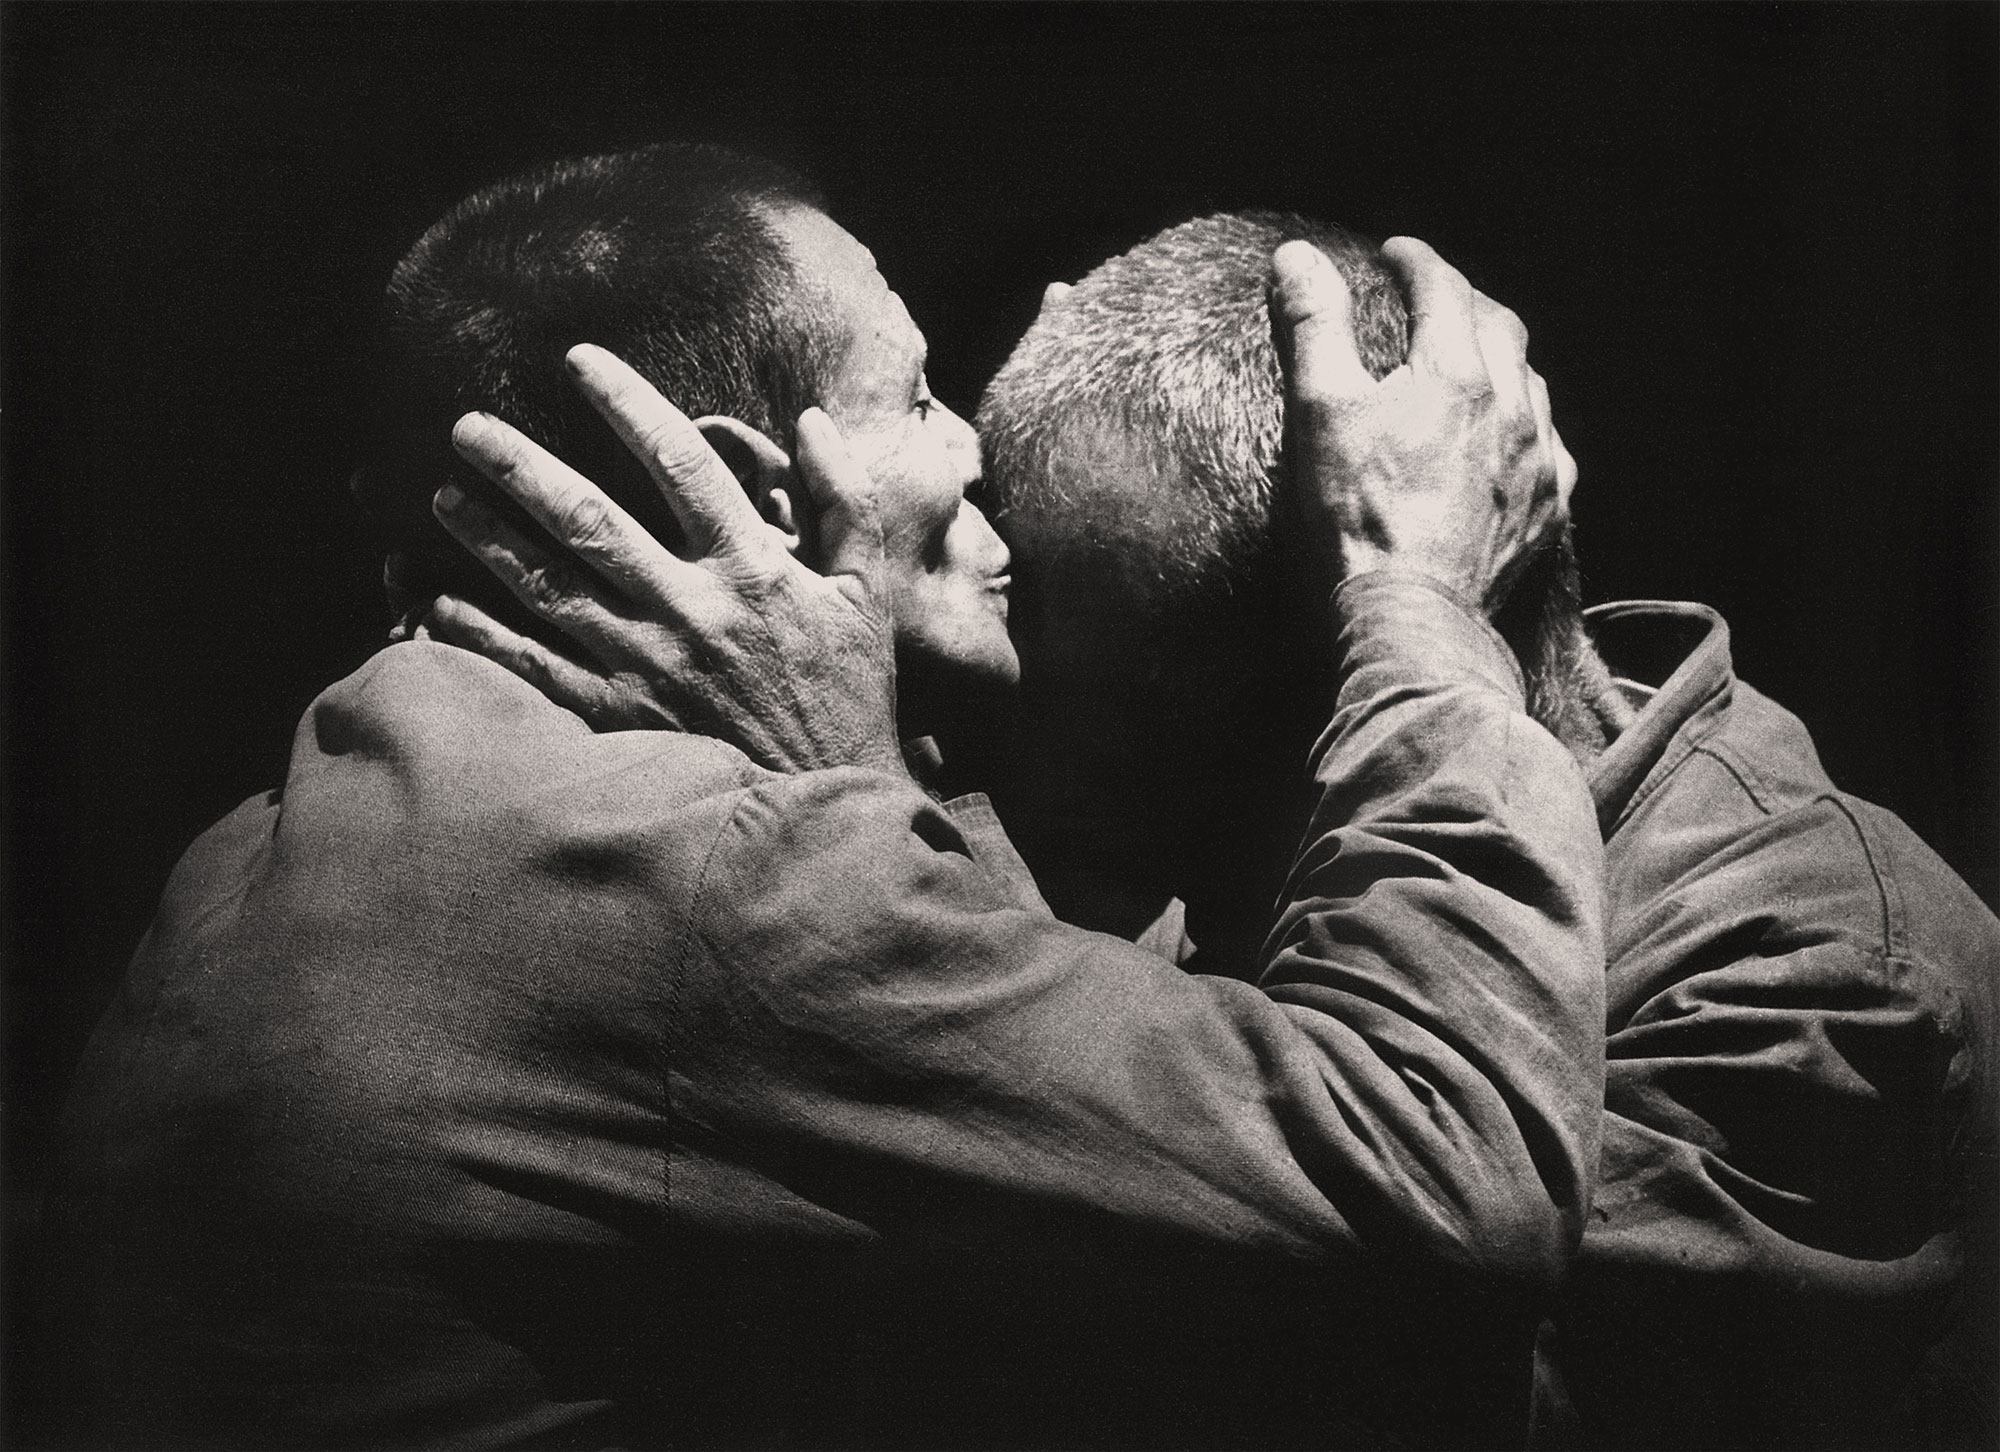 First Kiss of Freedom | Jacko Vassilev – The Joy of Freedom | Luz Art Los Angeles, CA